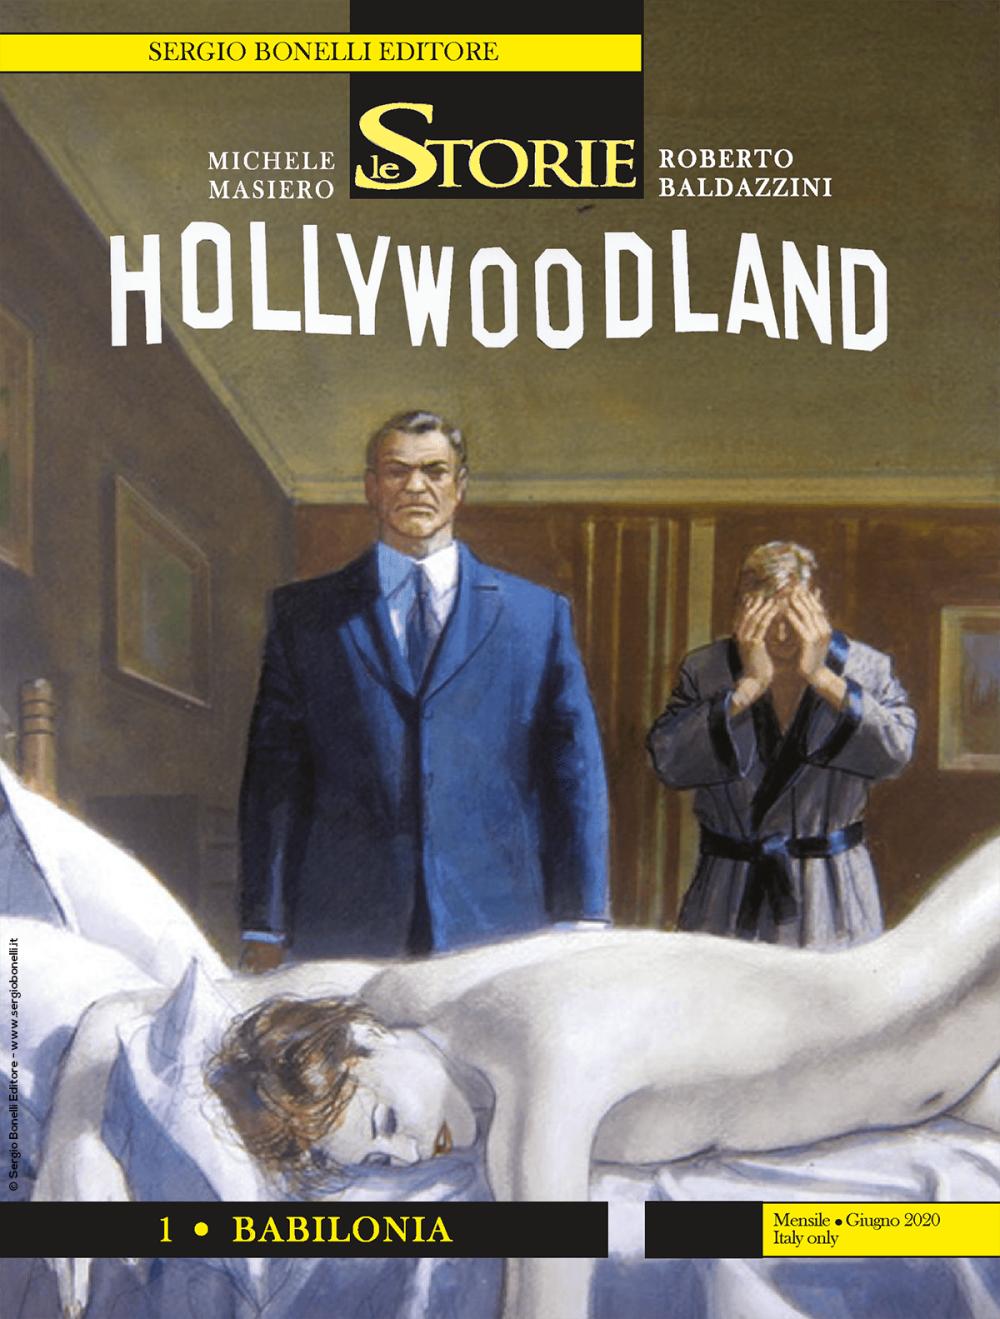 Hollywoodland 1 - Babilonia - Le Storie 93 cover